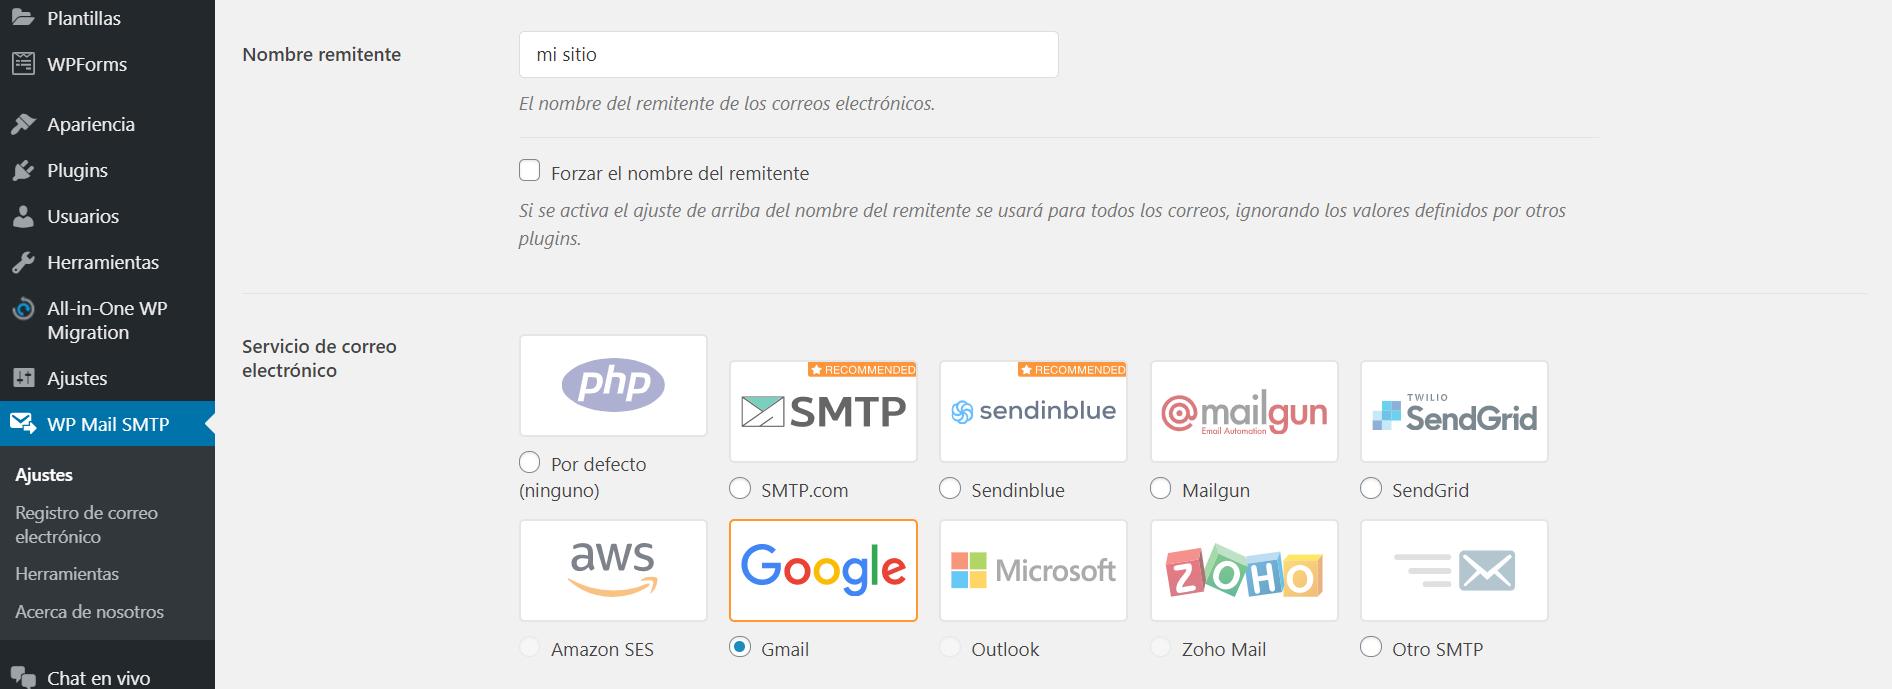 Configurar WP Mail SMTP